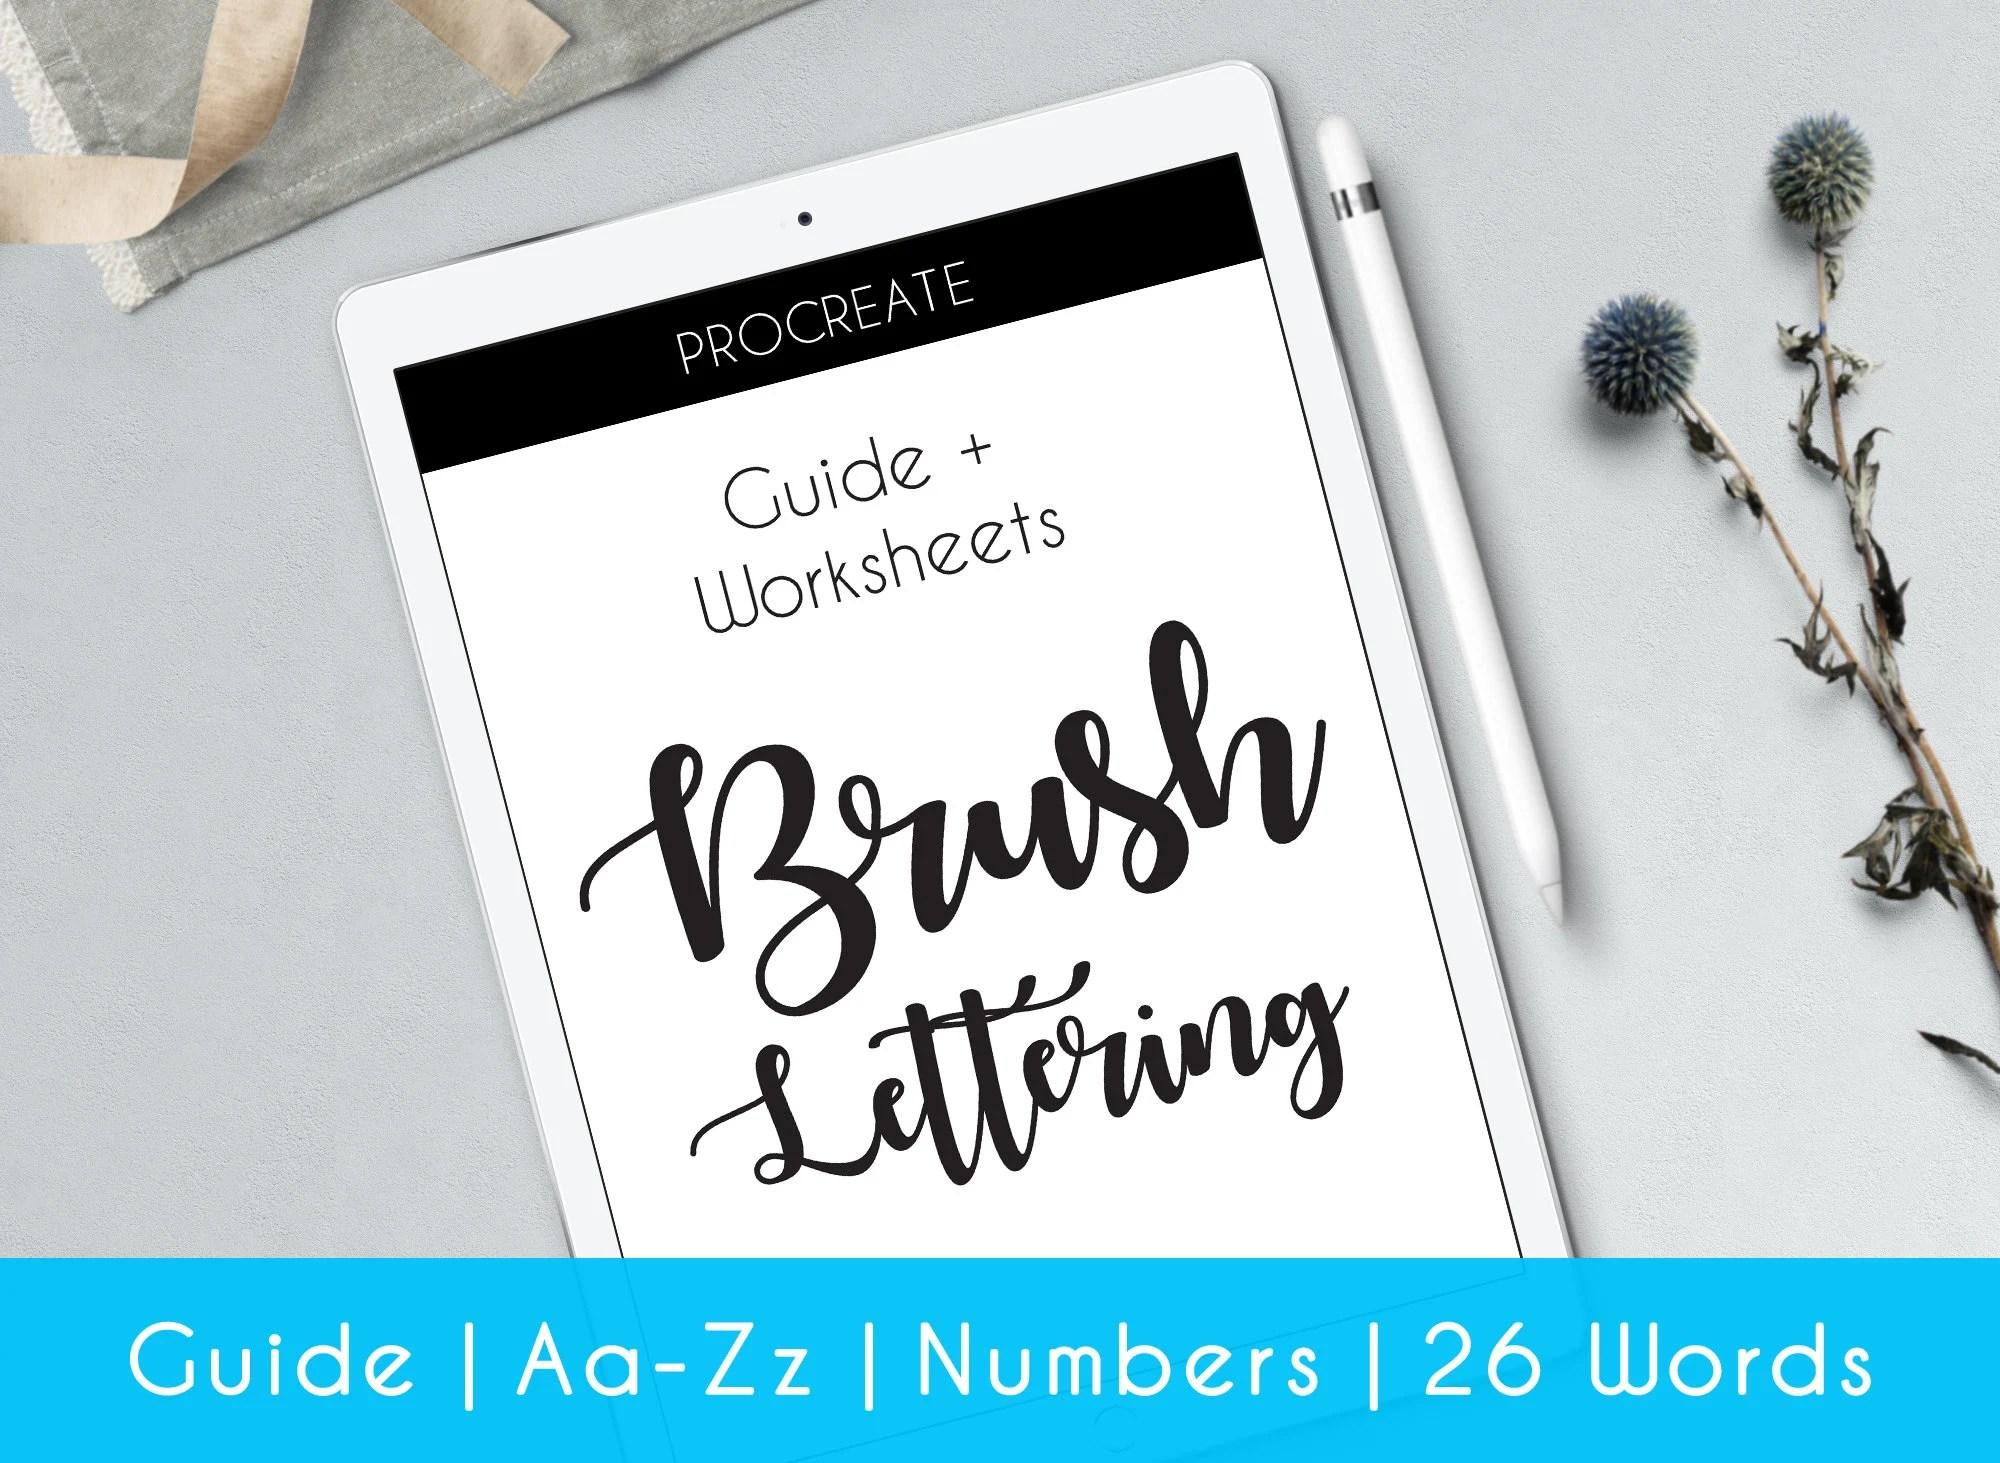 Ipad Hand Brush Lettering Procreate Worksheets Complete